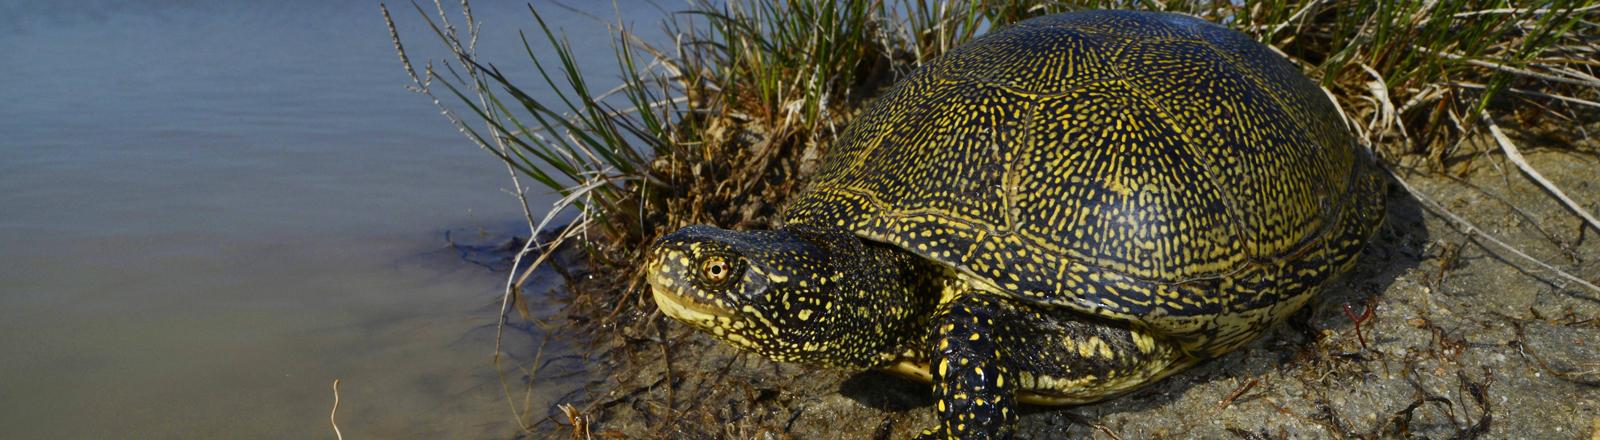 Europäische Sumpfschildkröte